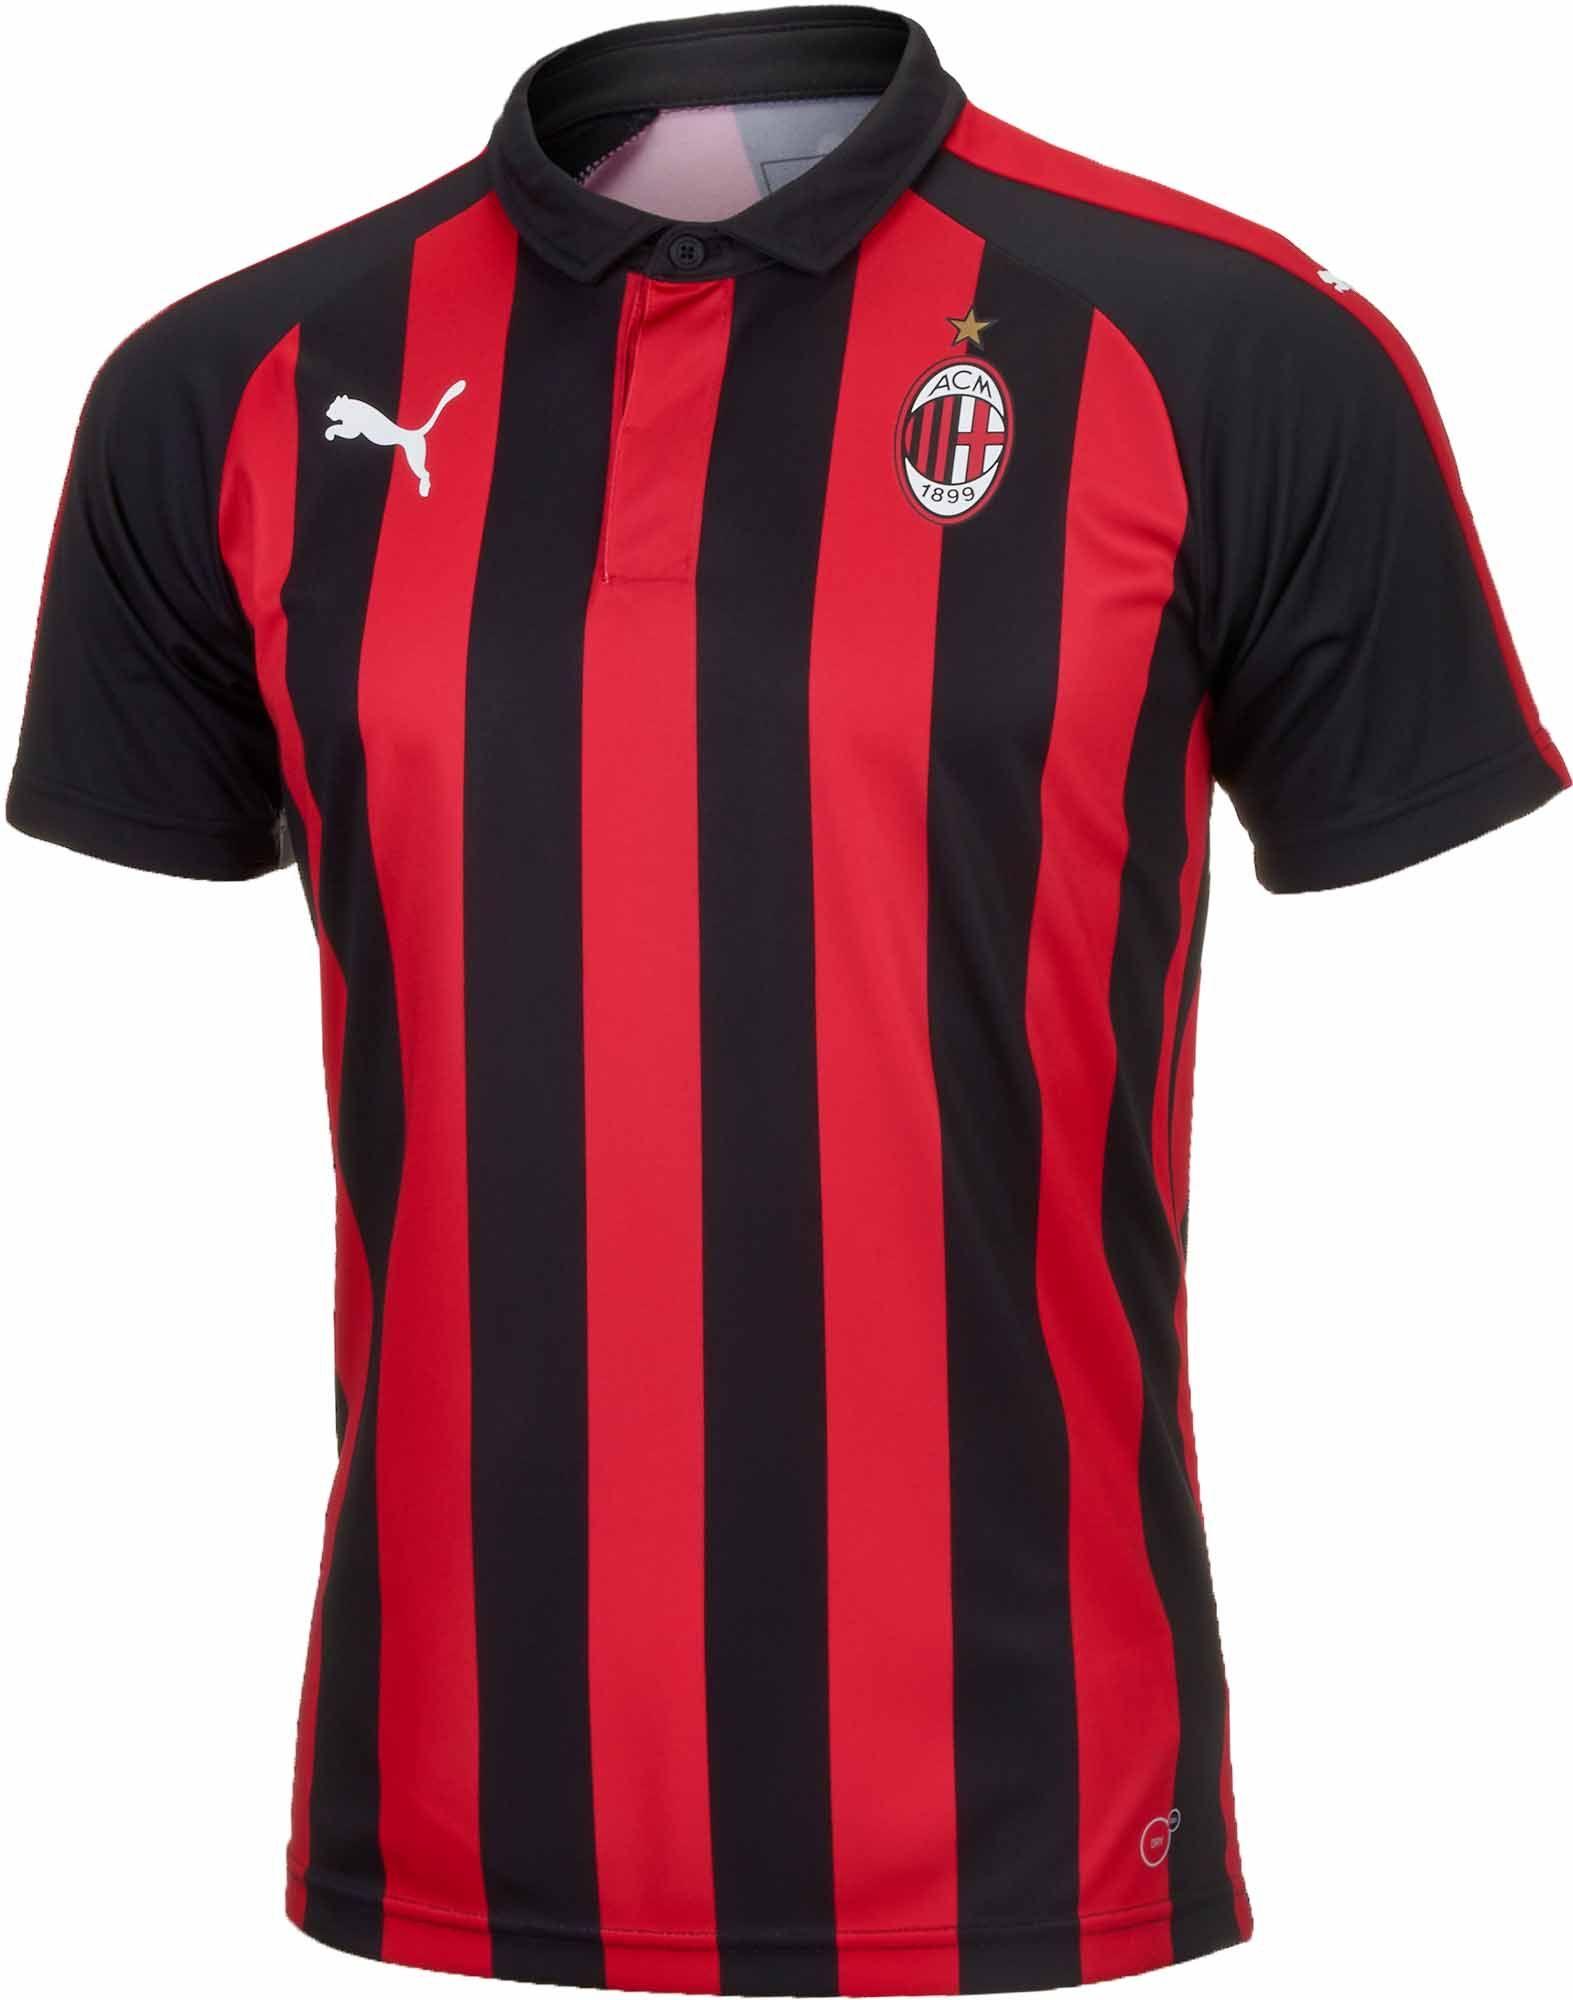 Download Puma Ac Milan Home Jersey Special Edition 2018 19 Soccerpro Pakaian Olahraga Jersey Sepak Bola Kaos Sablon